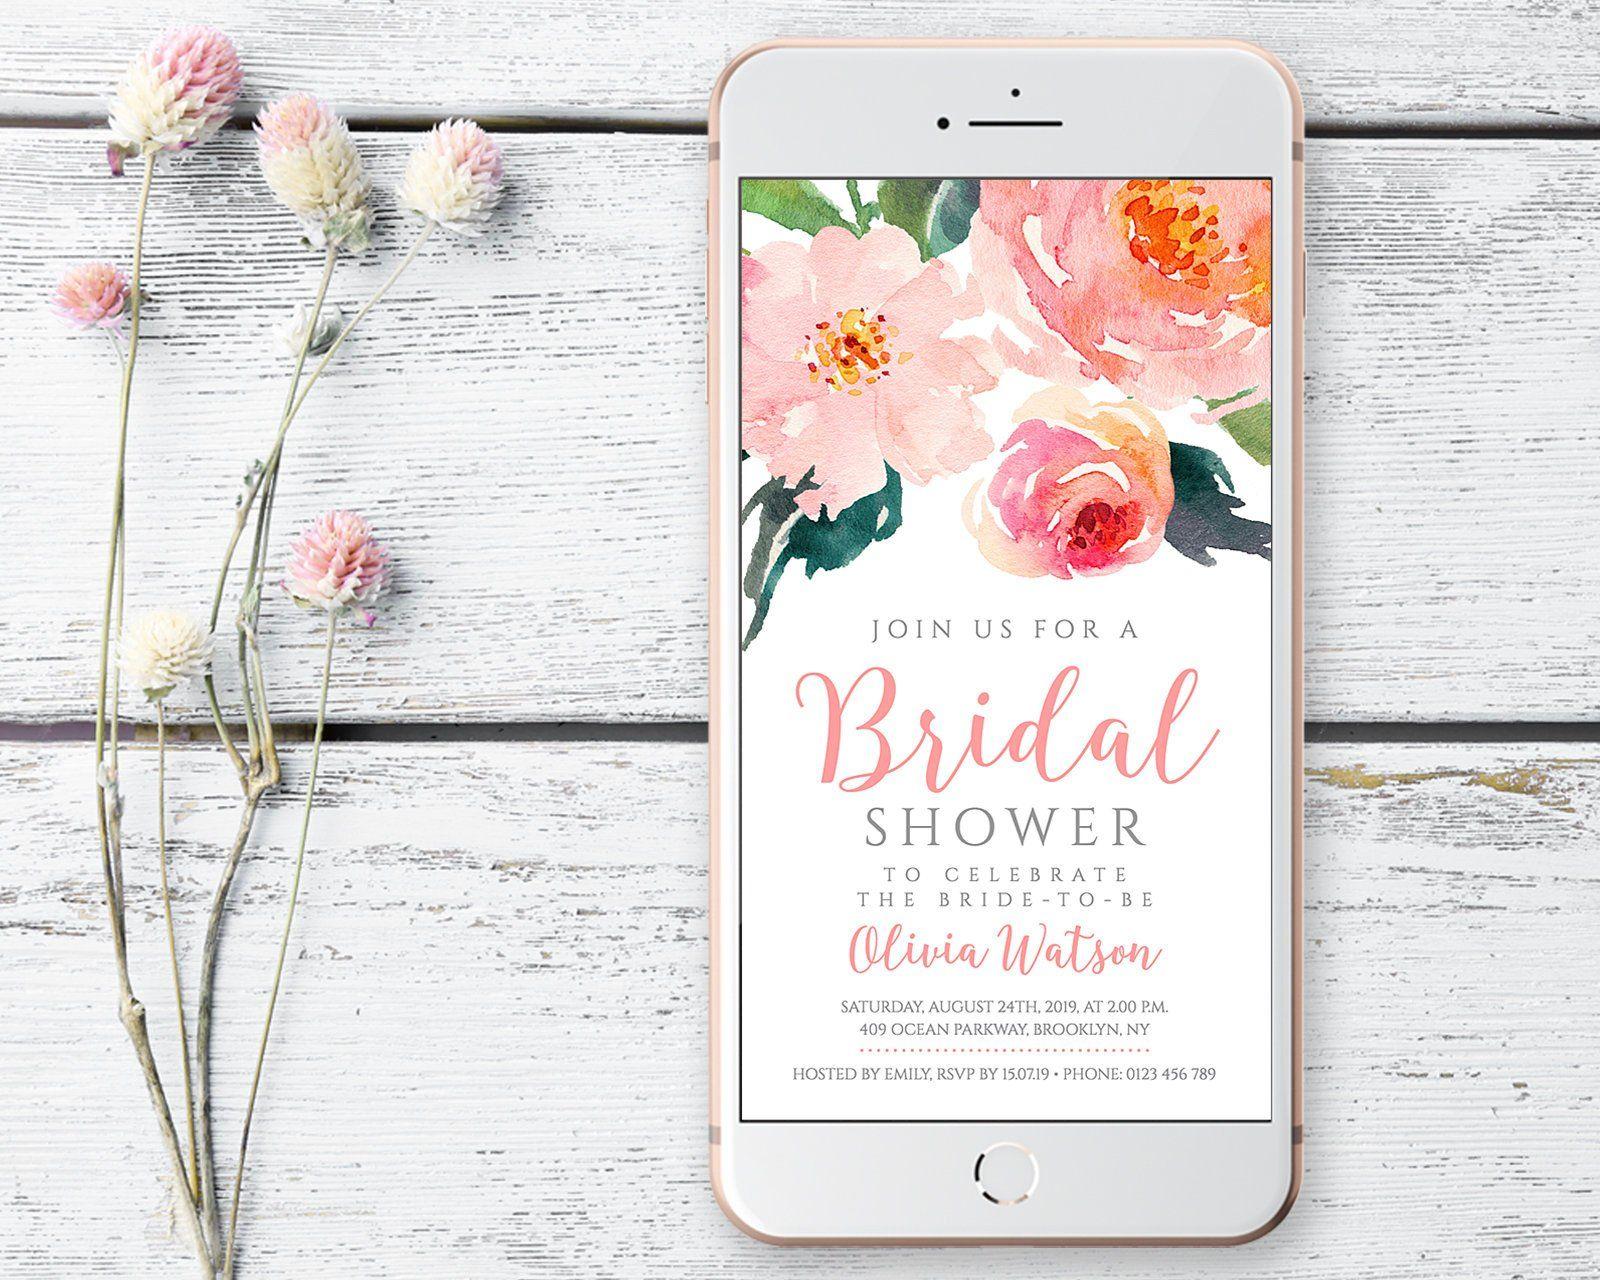 e008566b16e Electronic Bridal shower invitation with wild bohemian flowers ...